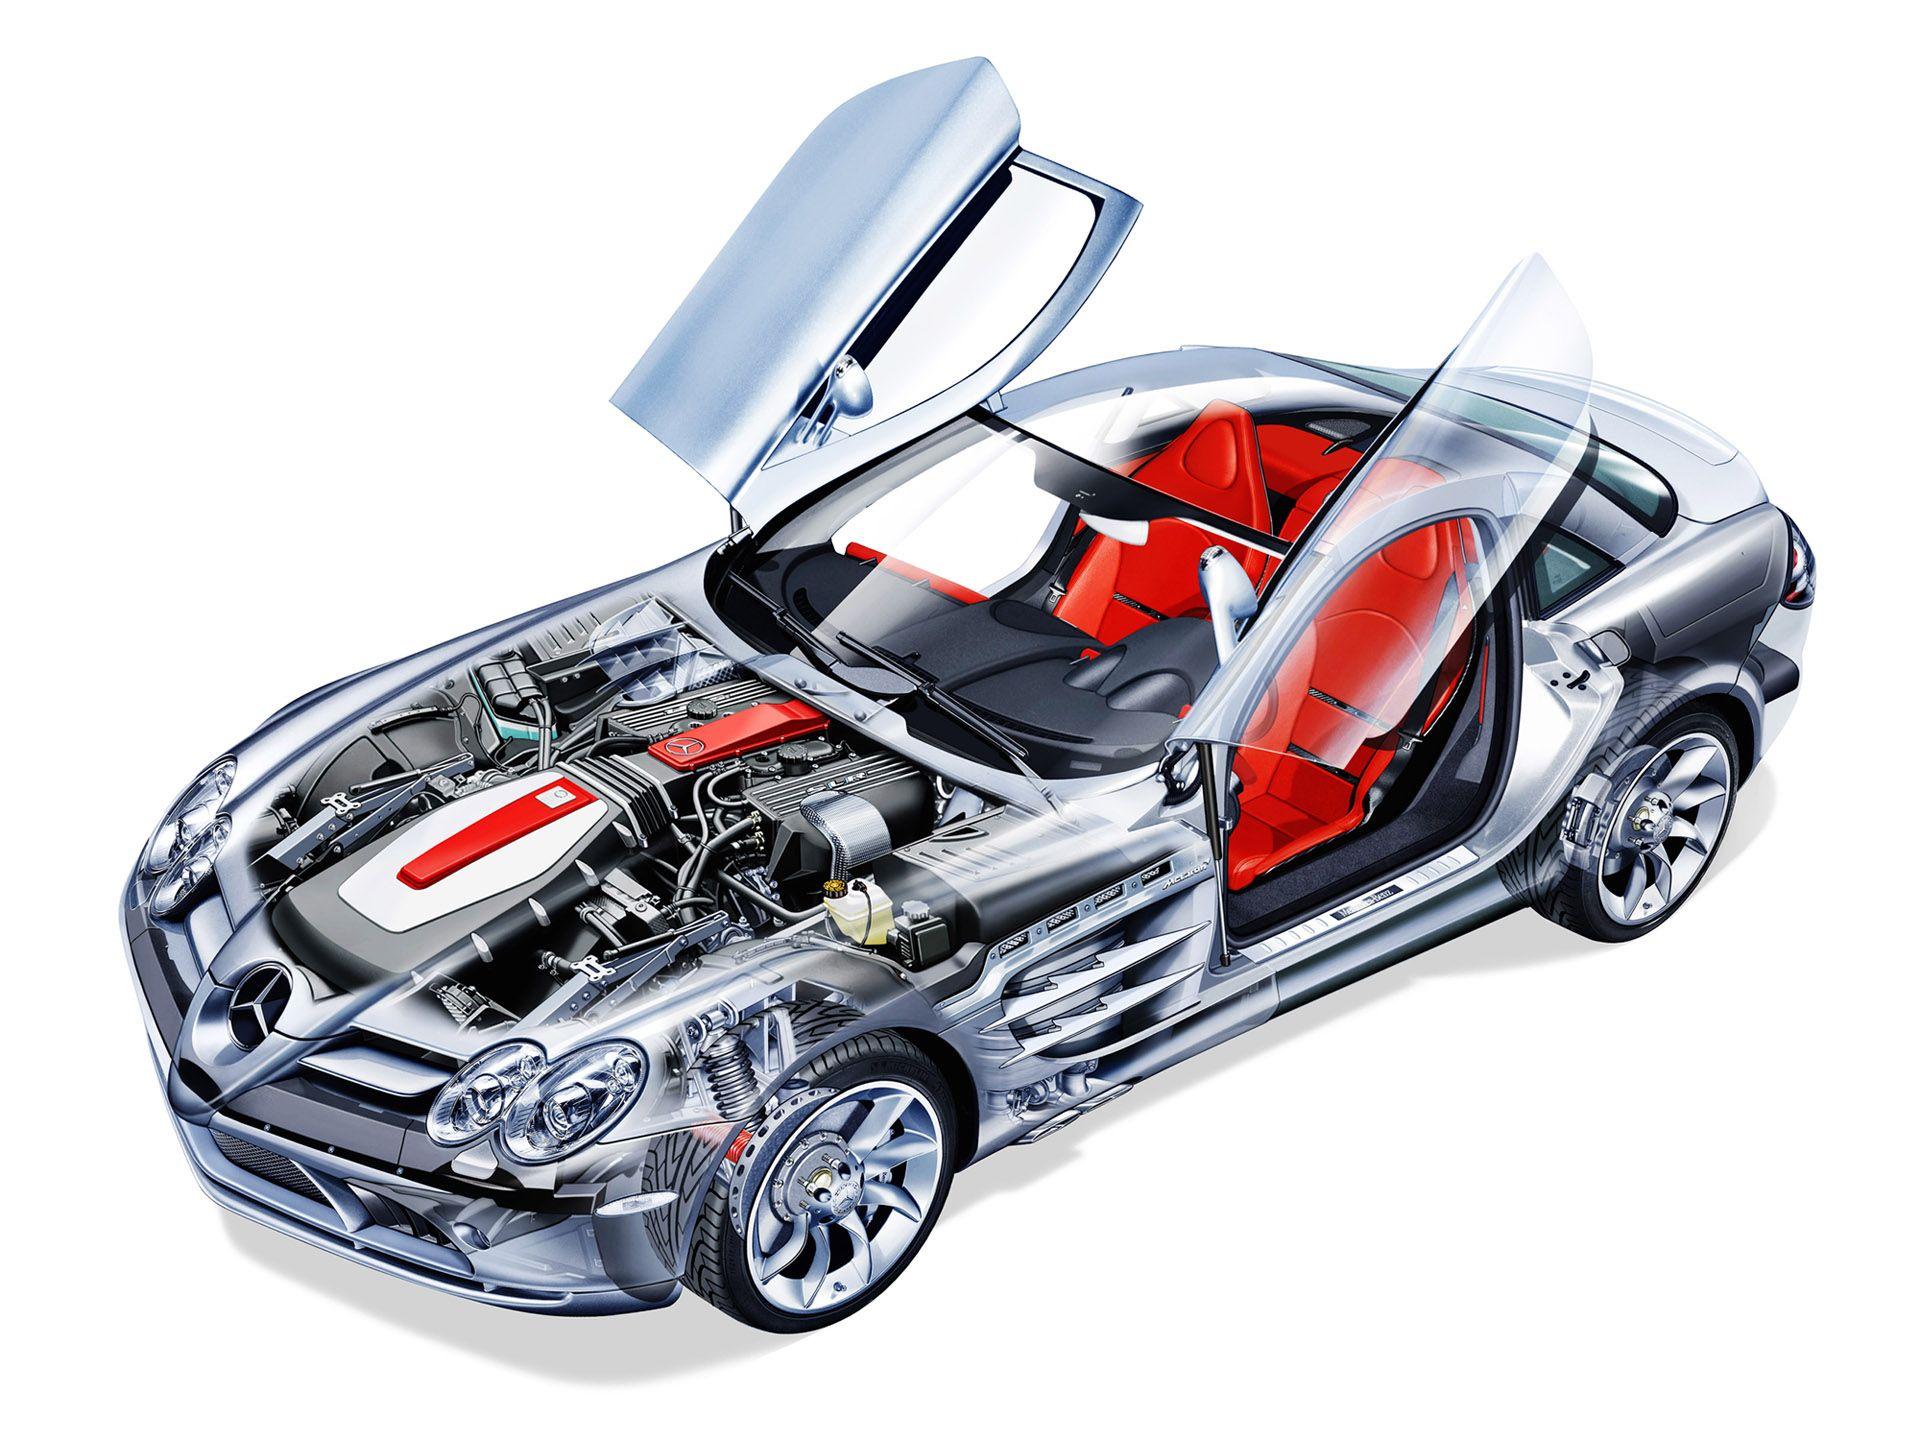 http://www.seriouswheels.com/pics-mno/Mercedes-Benz-SLR-McLaren ...